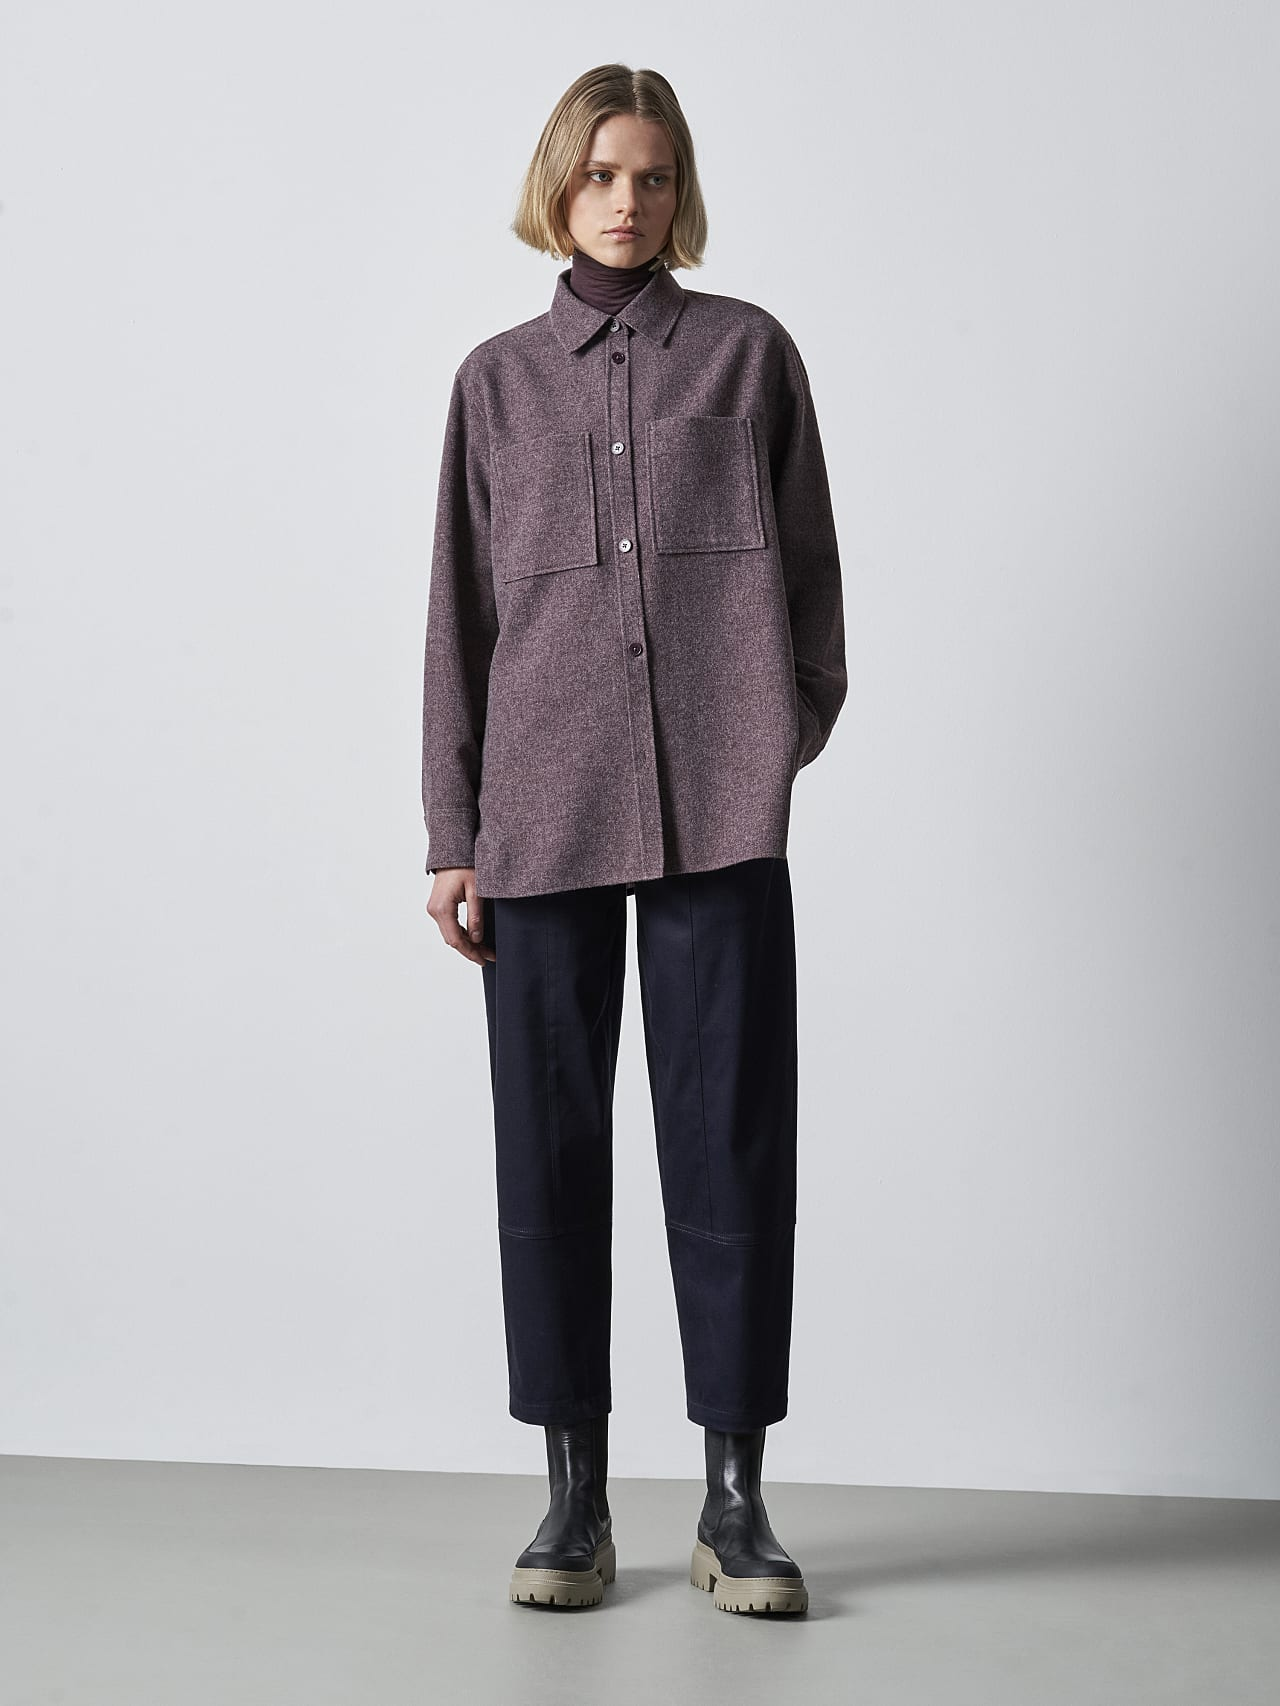 WOVIE V1.Y5.02 Wool Over-Shirt Burgundy Front Alpha Tauri